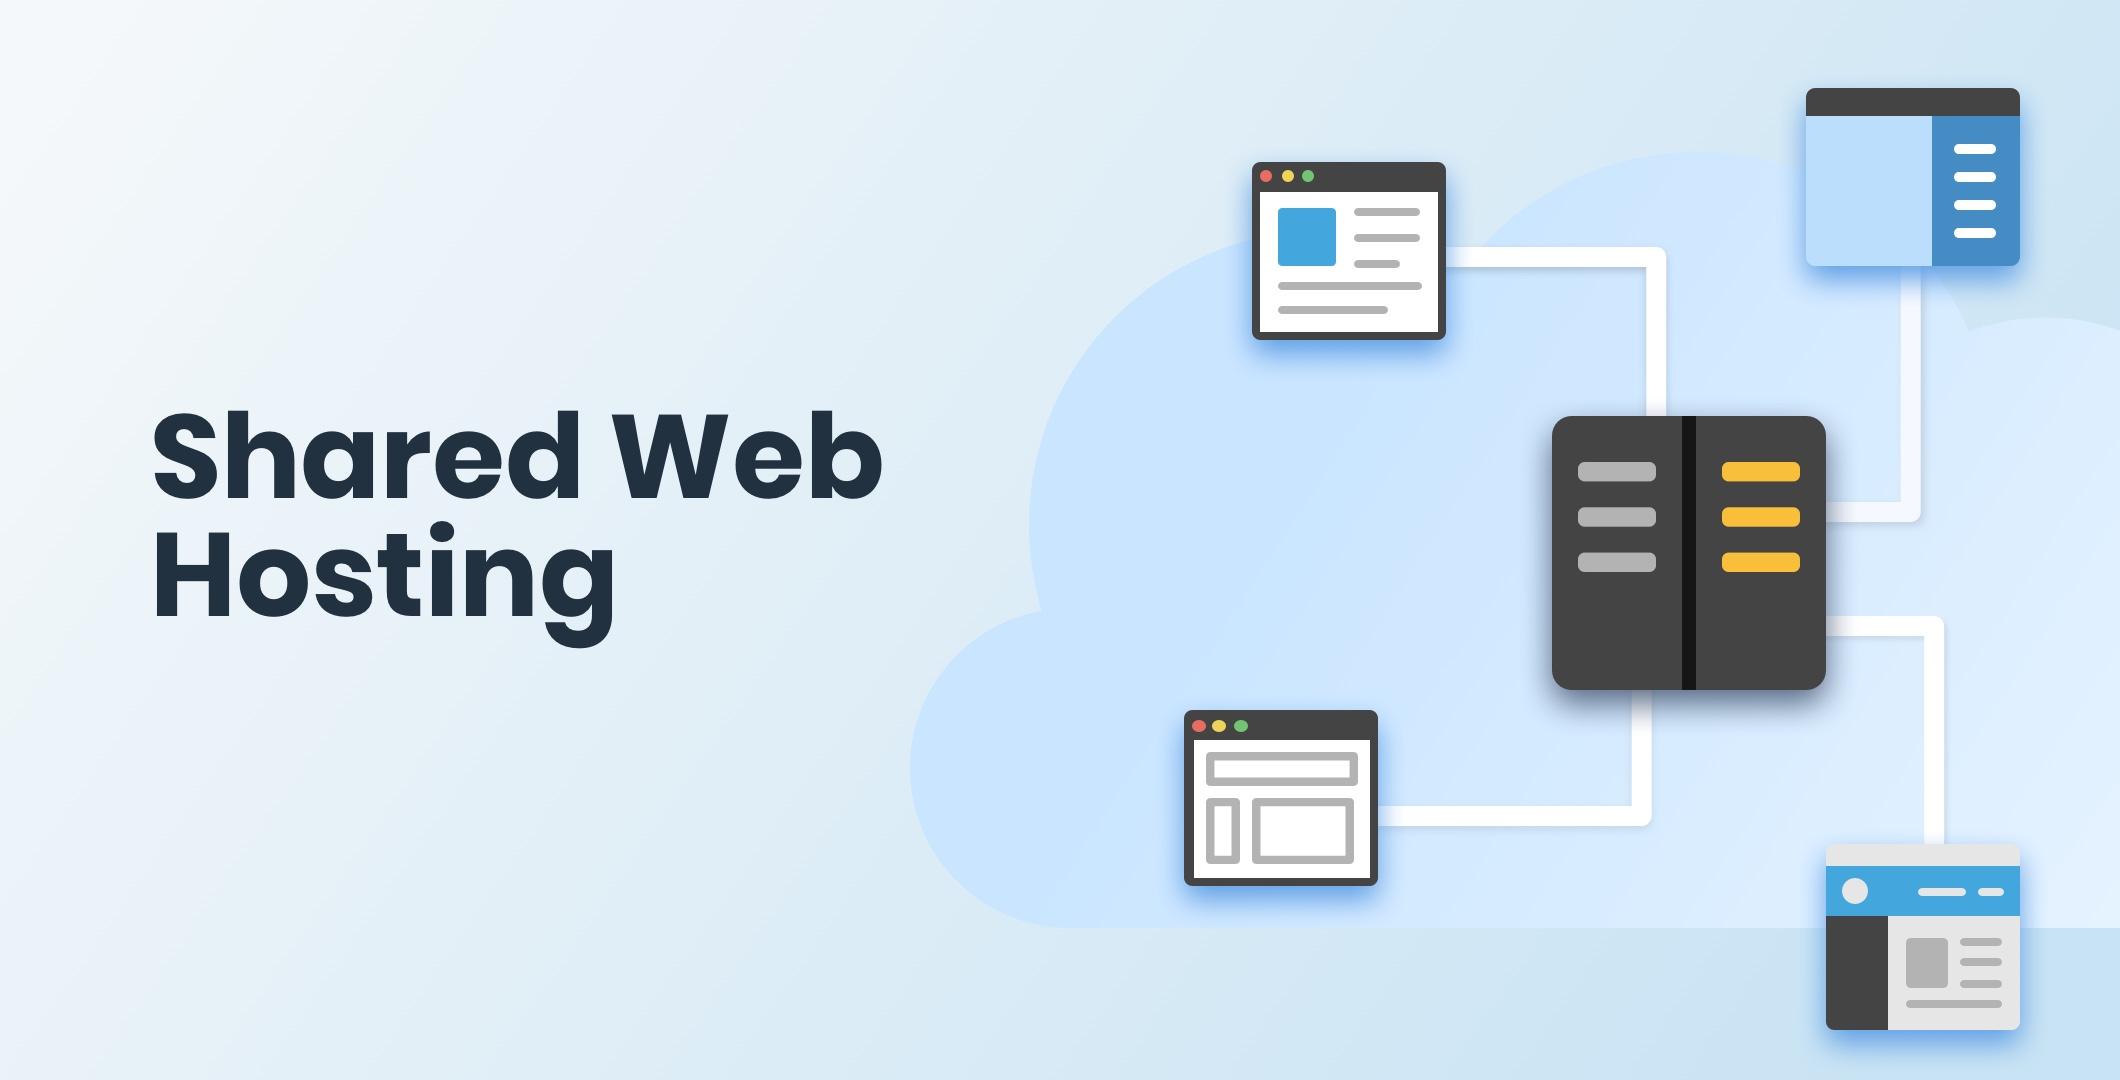 Shared Shared Web HostingWeb Hosting